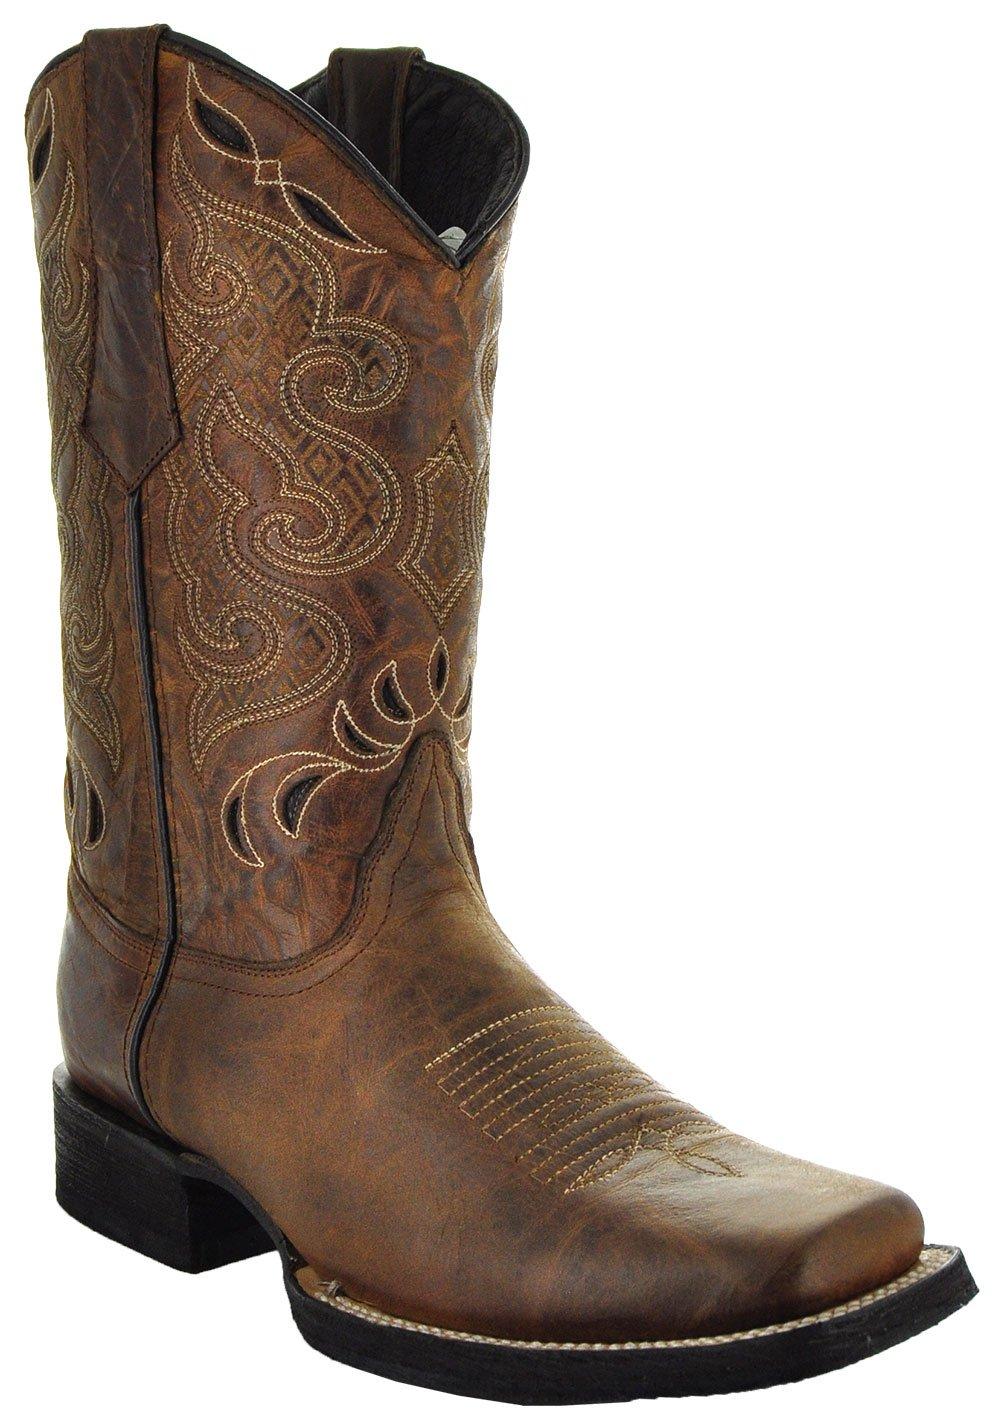 Soto Boots Men's Broad Square Toe Boots H50019 (9.5, Tan)